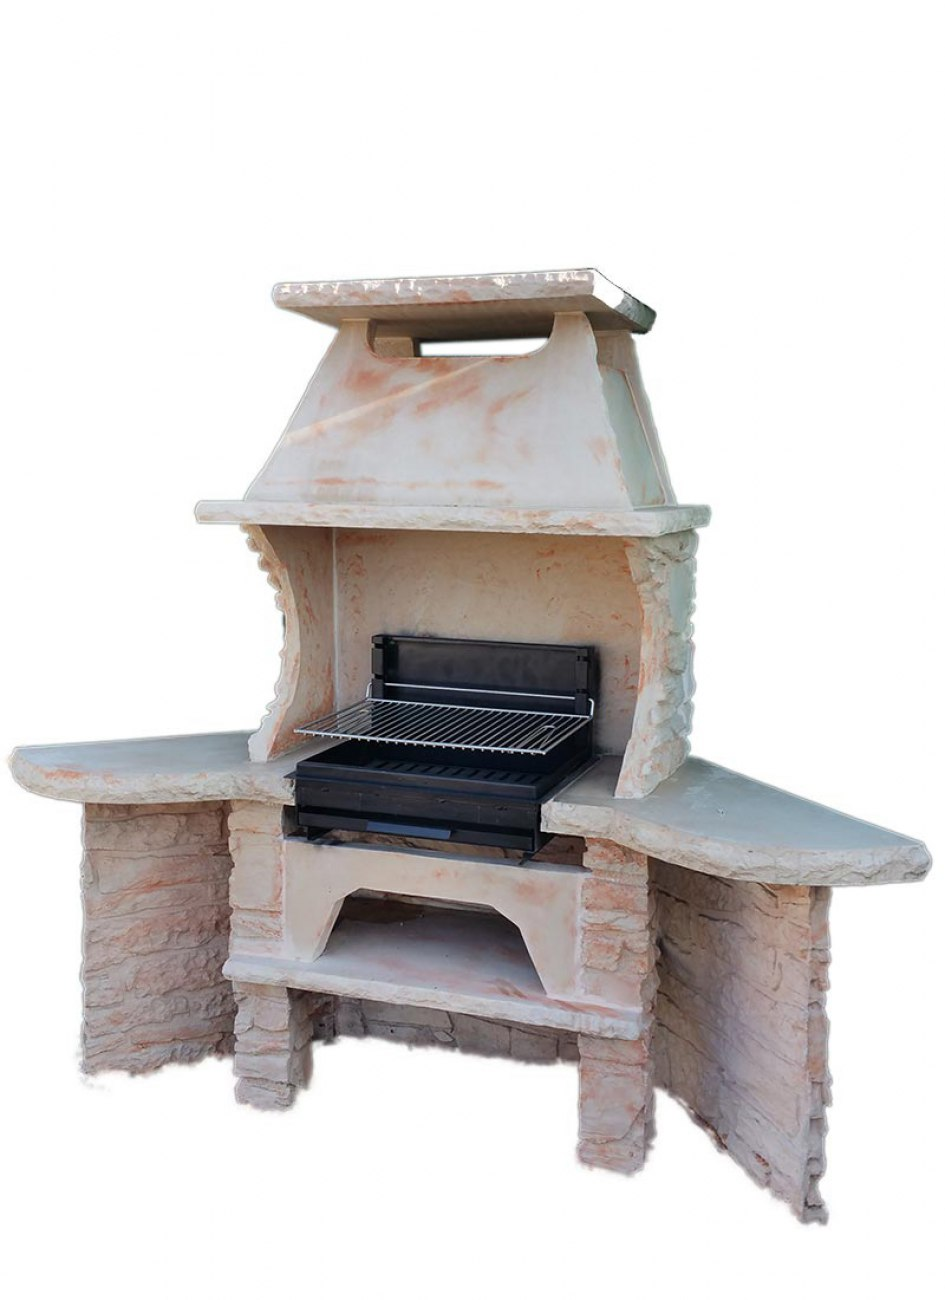 modele de barbecue exterieur simple cuisine with modele. Black Bedroom Furniture Sets. Home Design Ideas